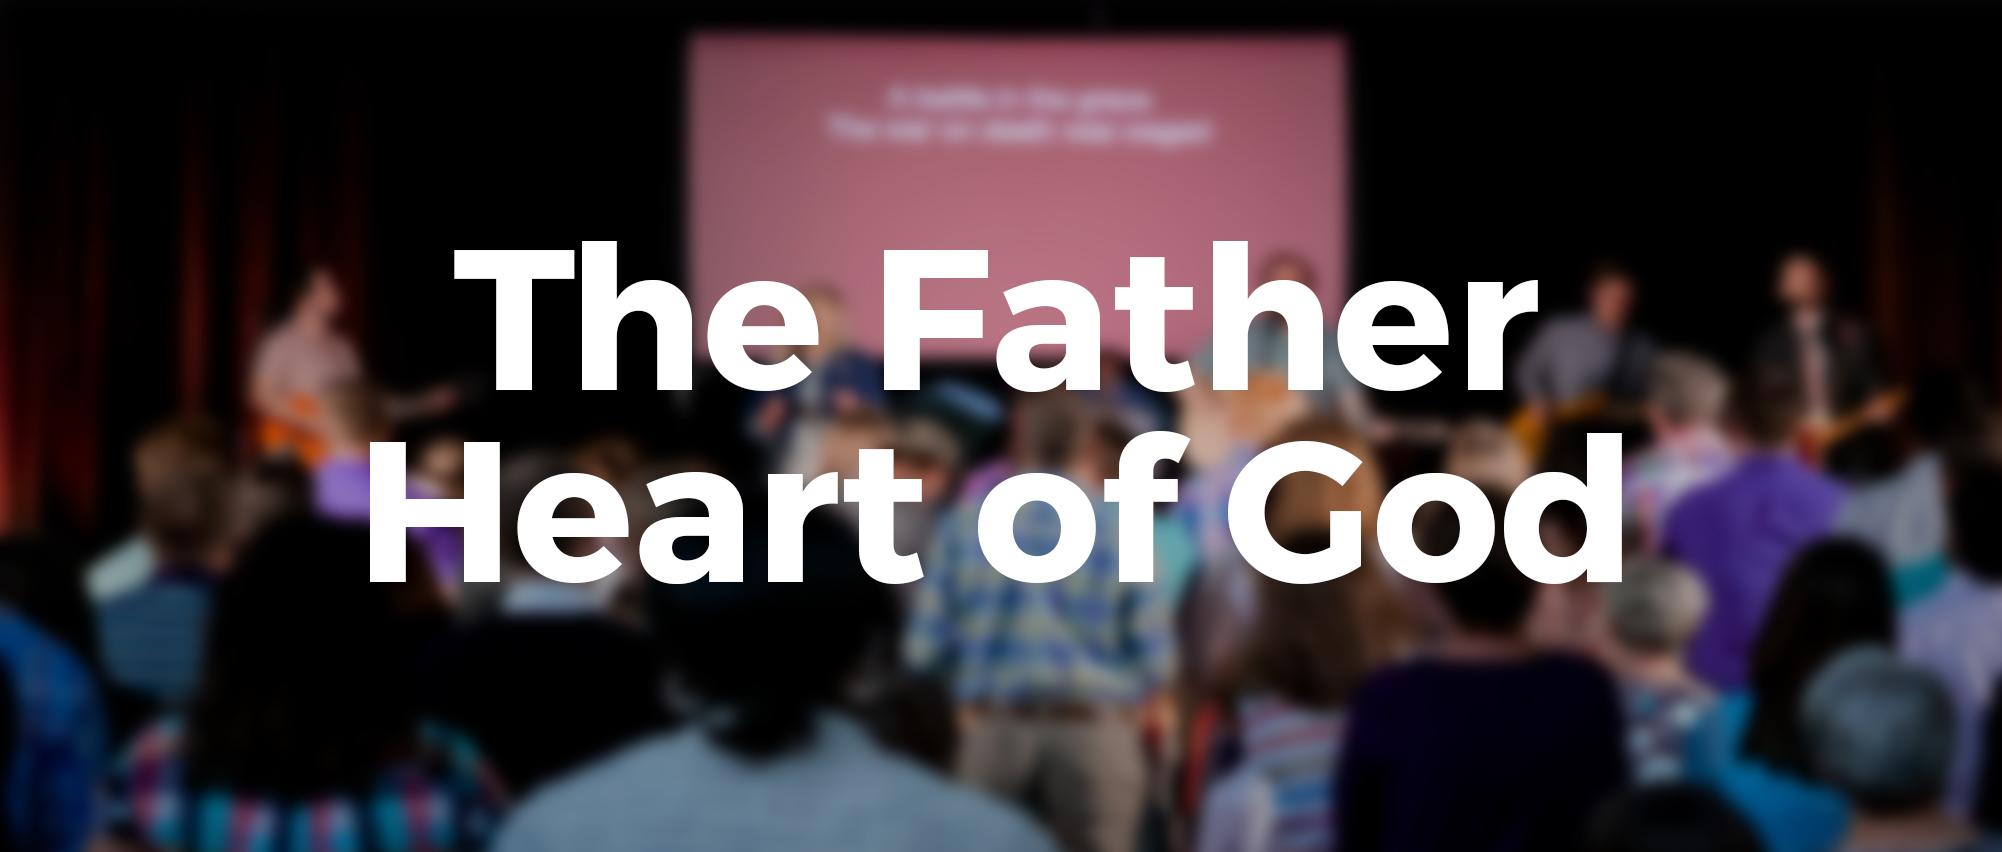 FatherHeartofGod.jpg